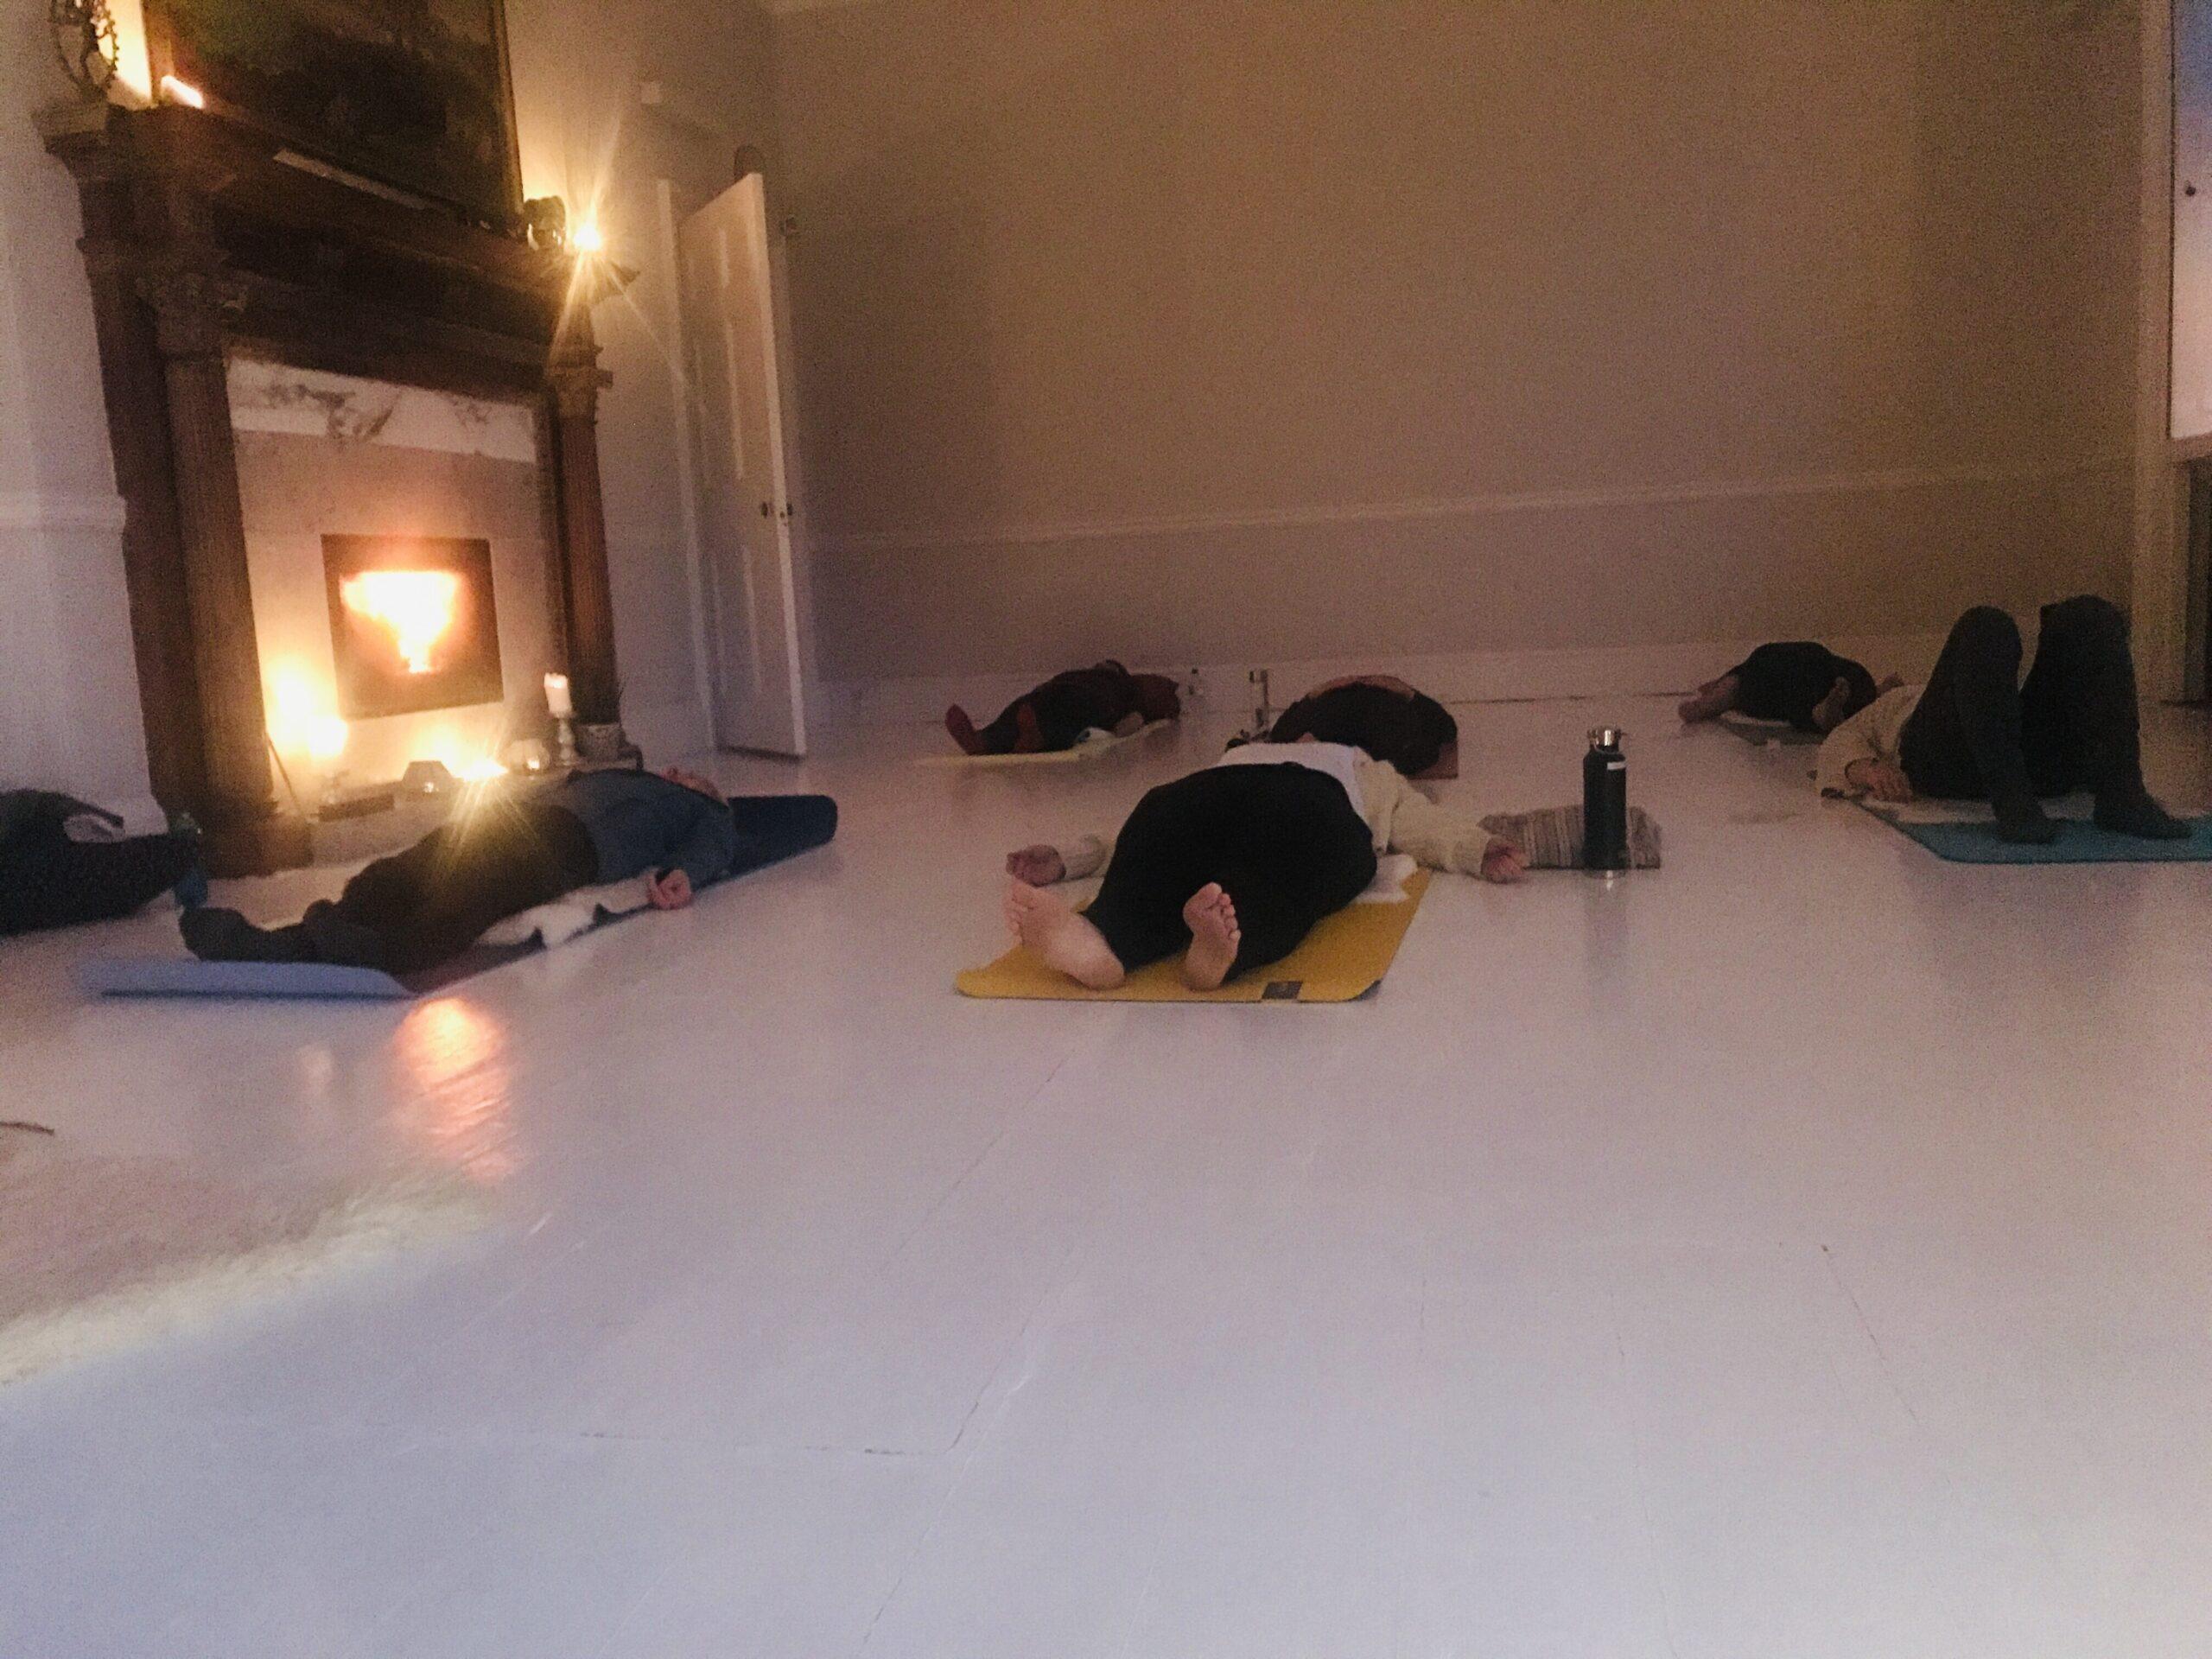 Somatic Kundalini retreats at Yoga Space Yorkshire